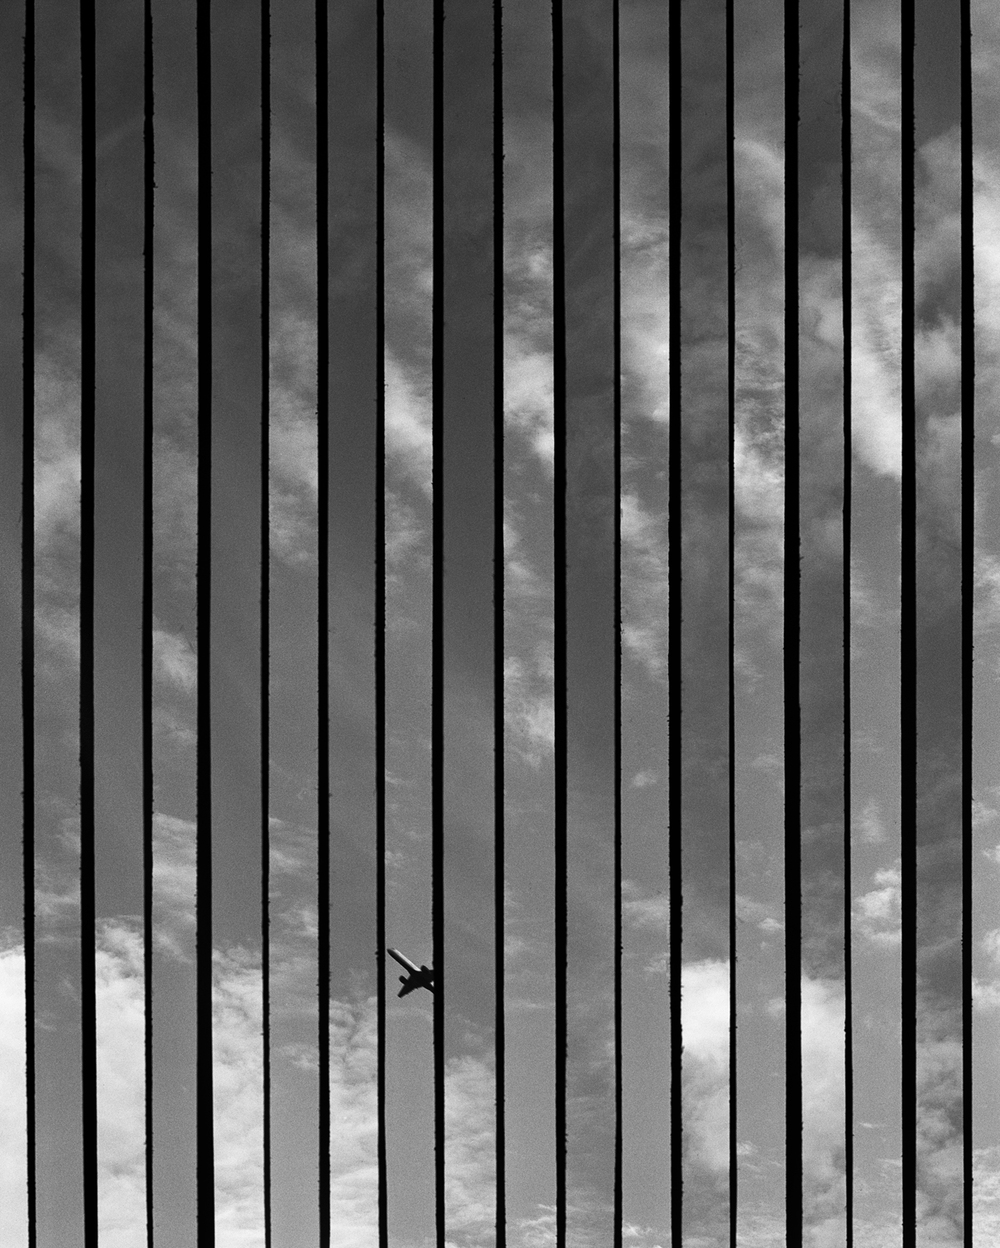 Lenticular Skyscape #4